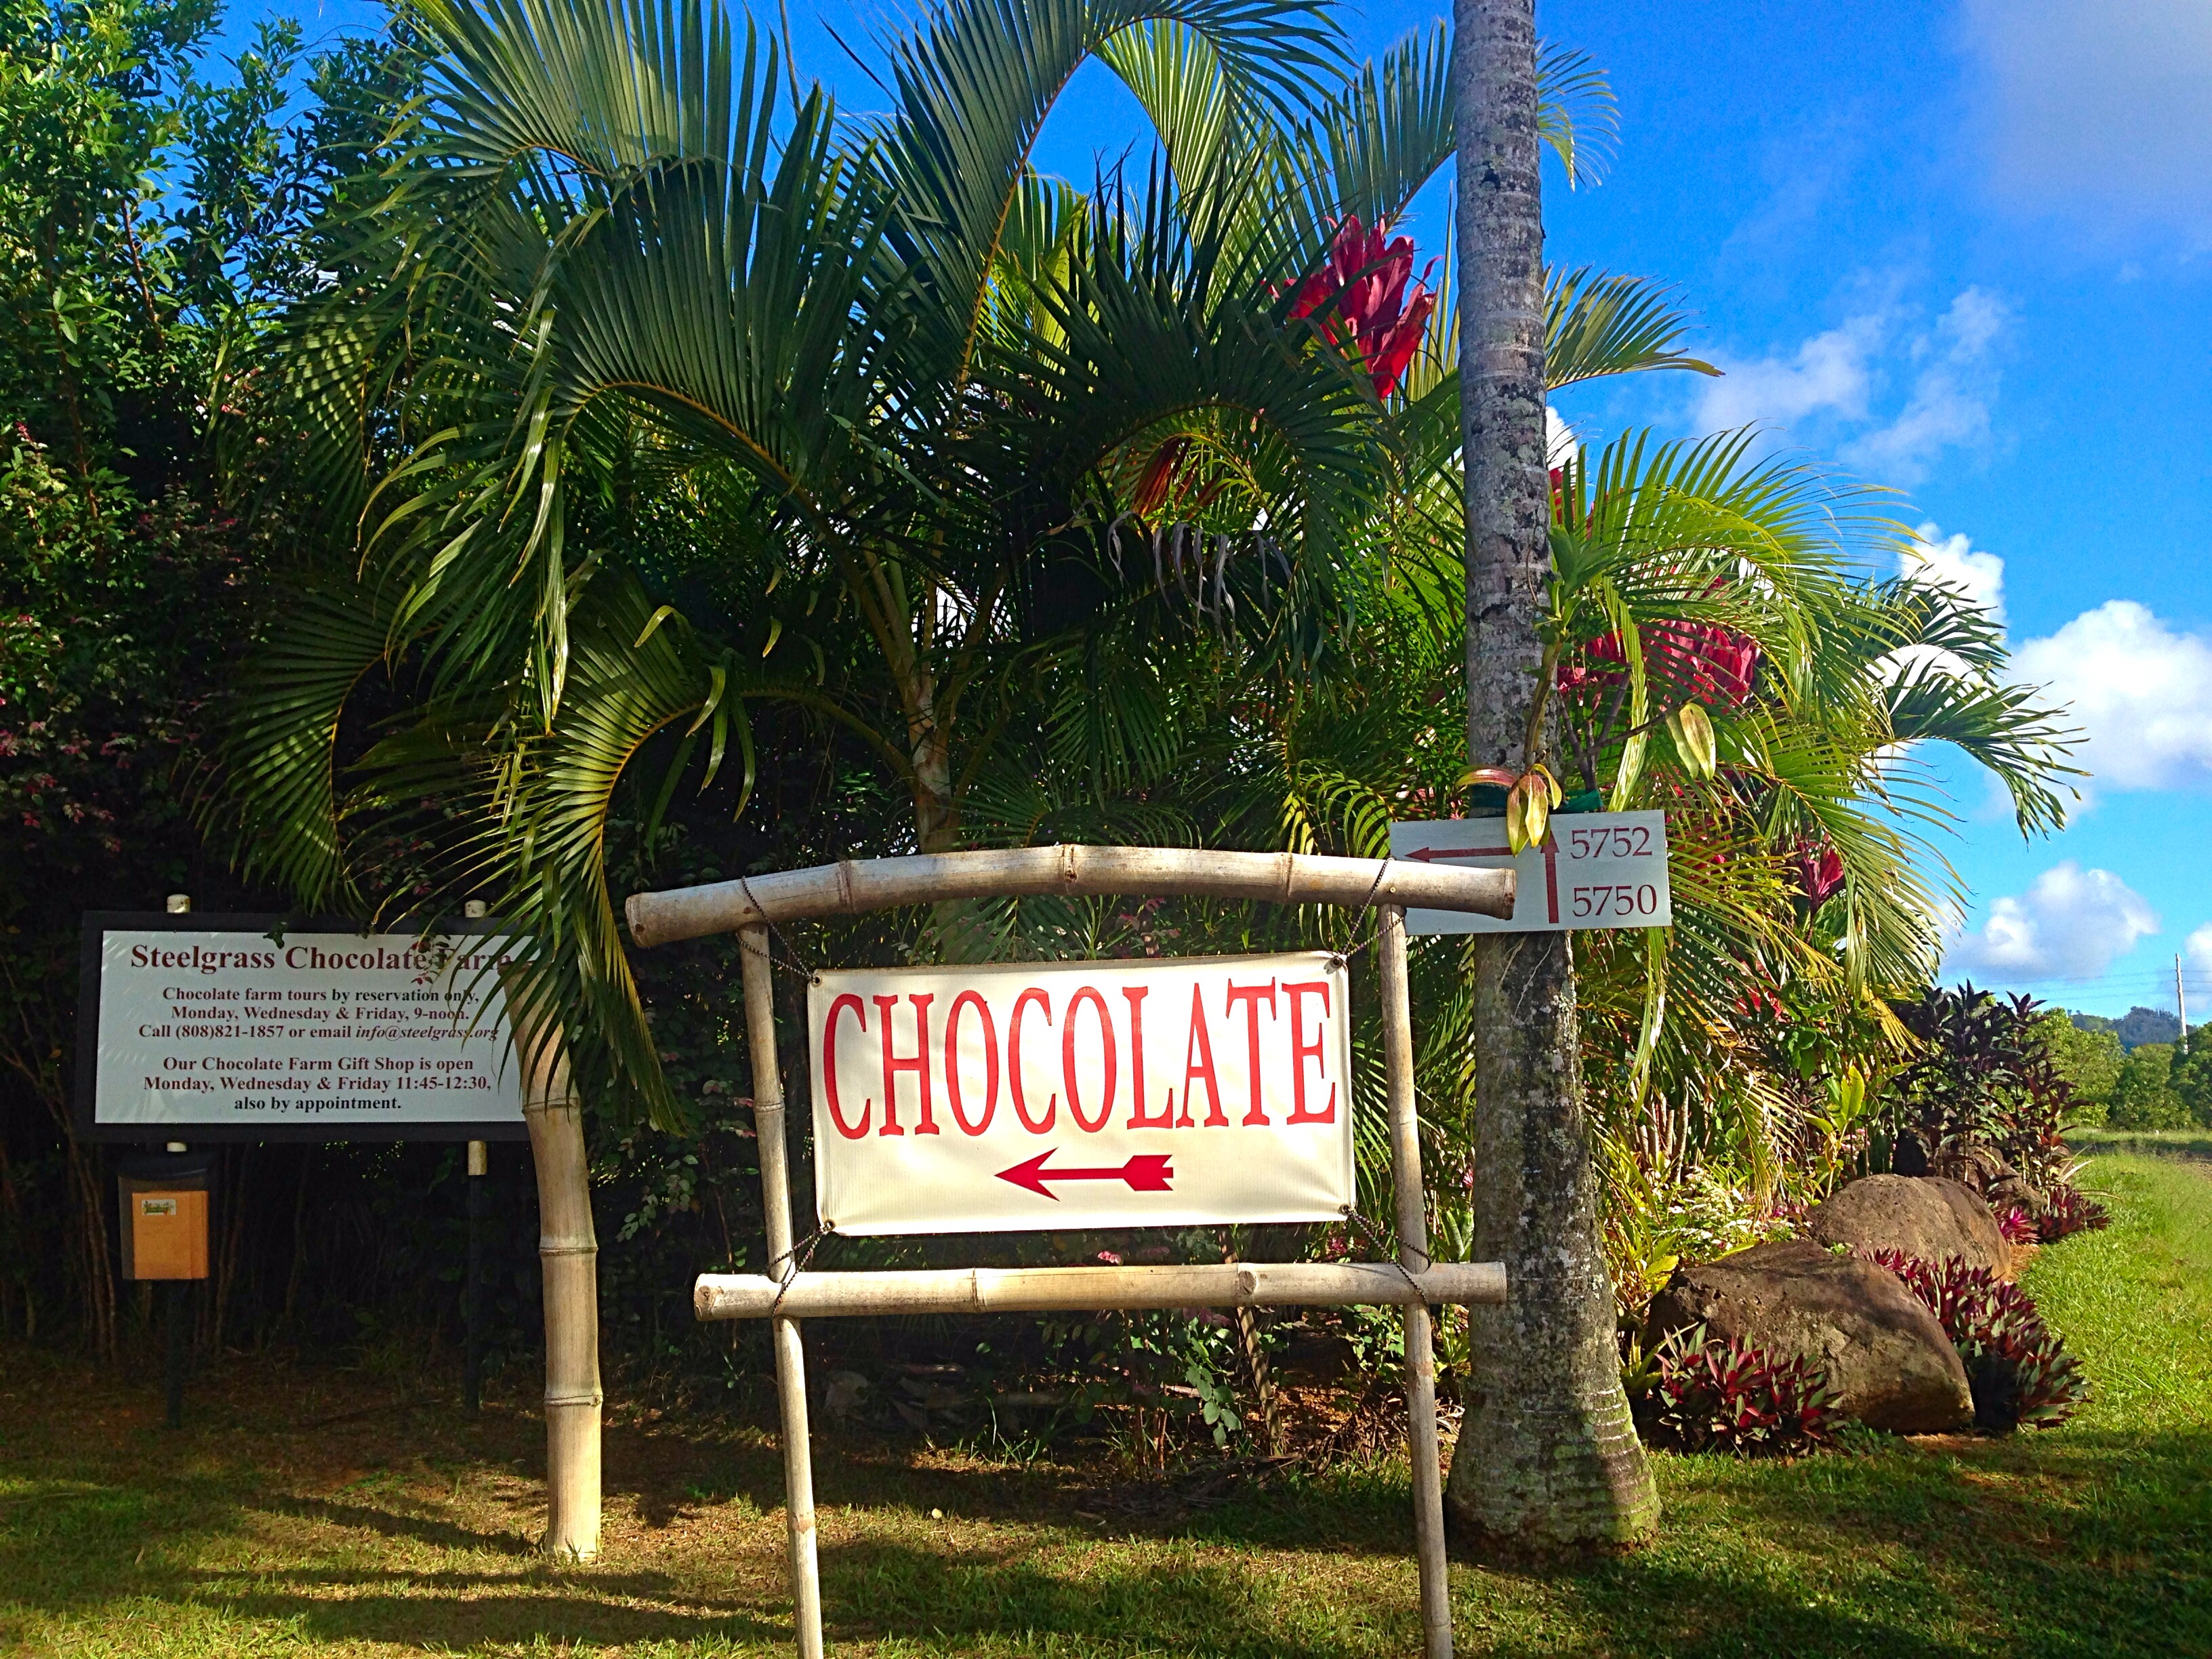 Steelgrass Chocolate Farm Tour, Kauai « 5 Wheels to 5 Star